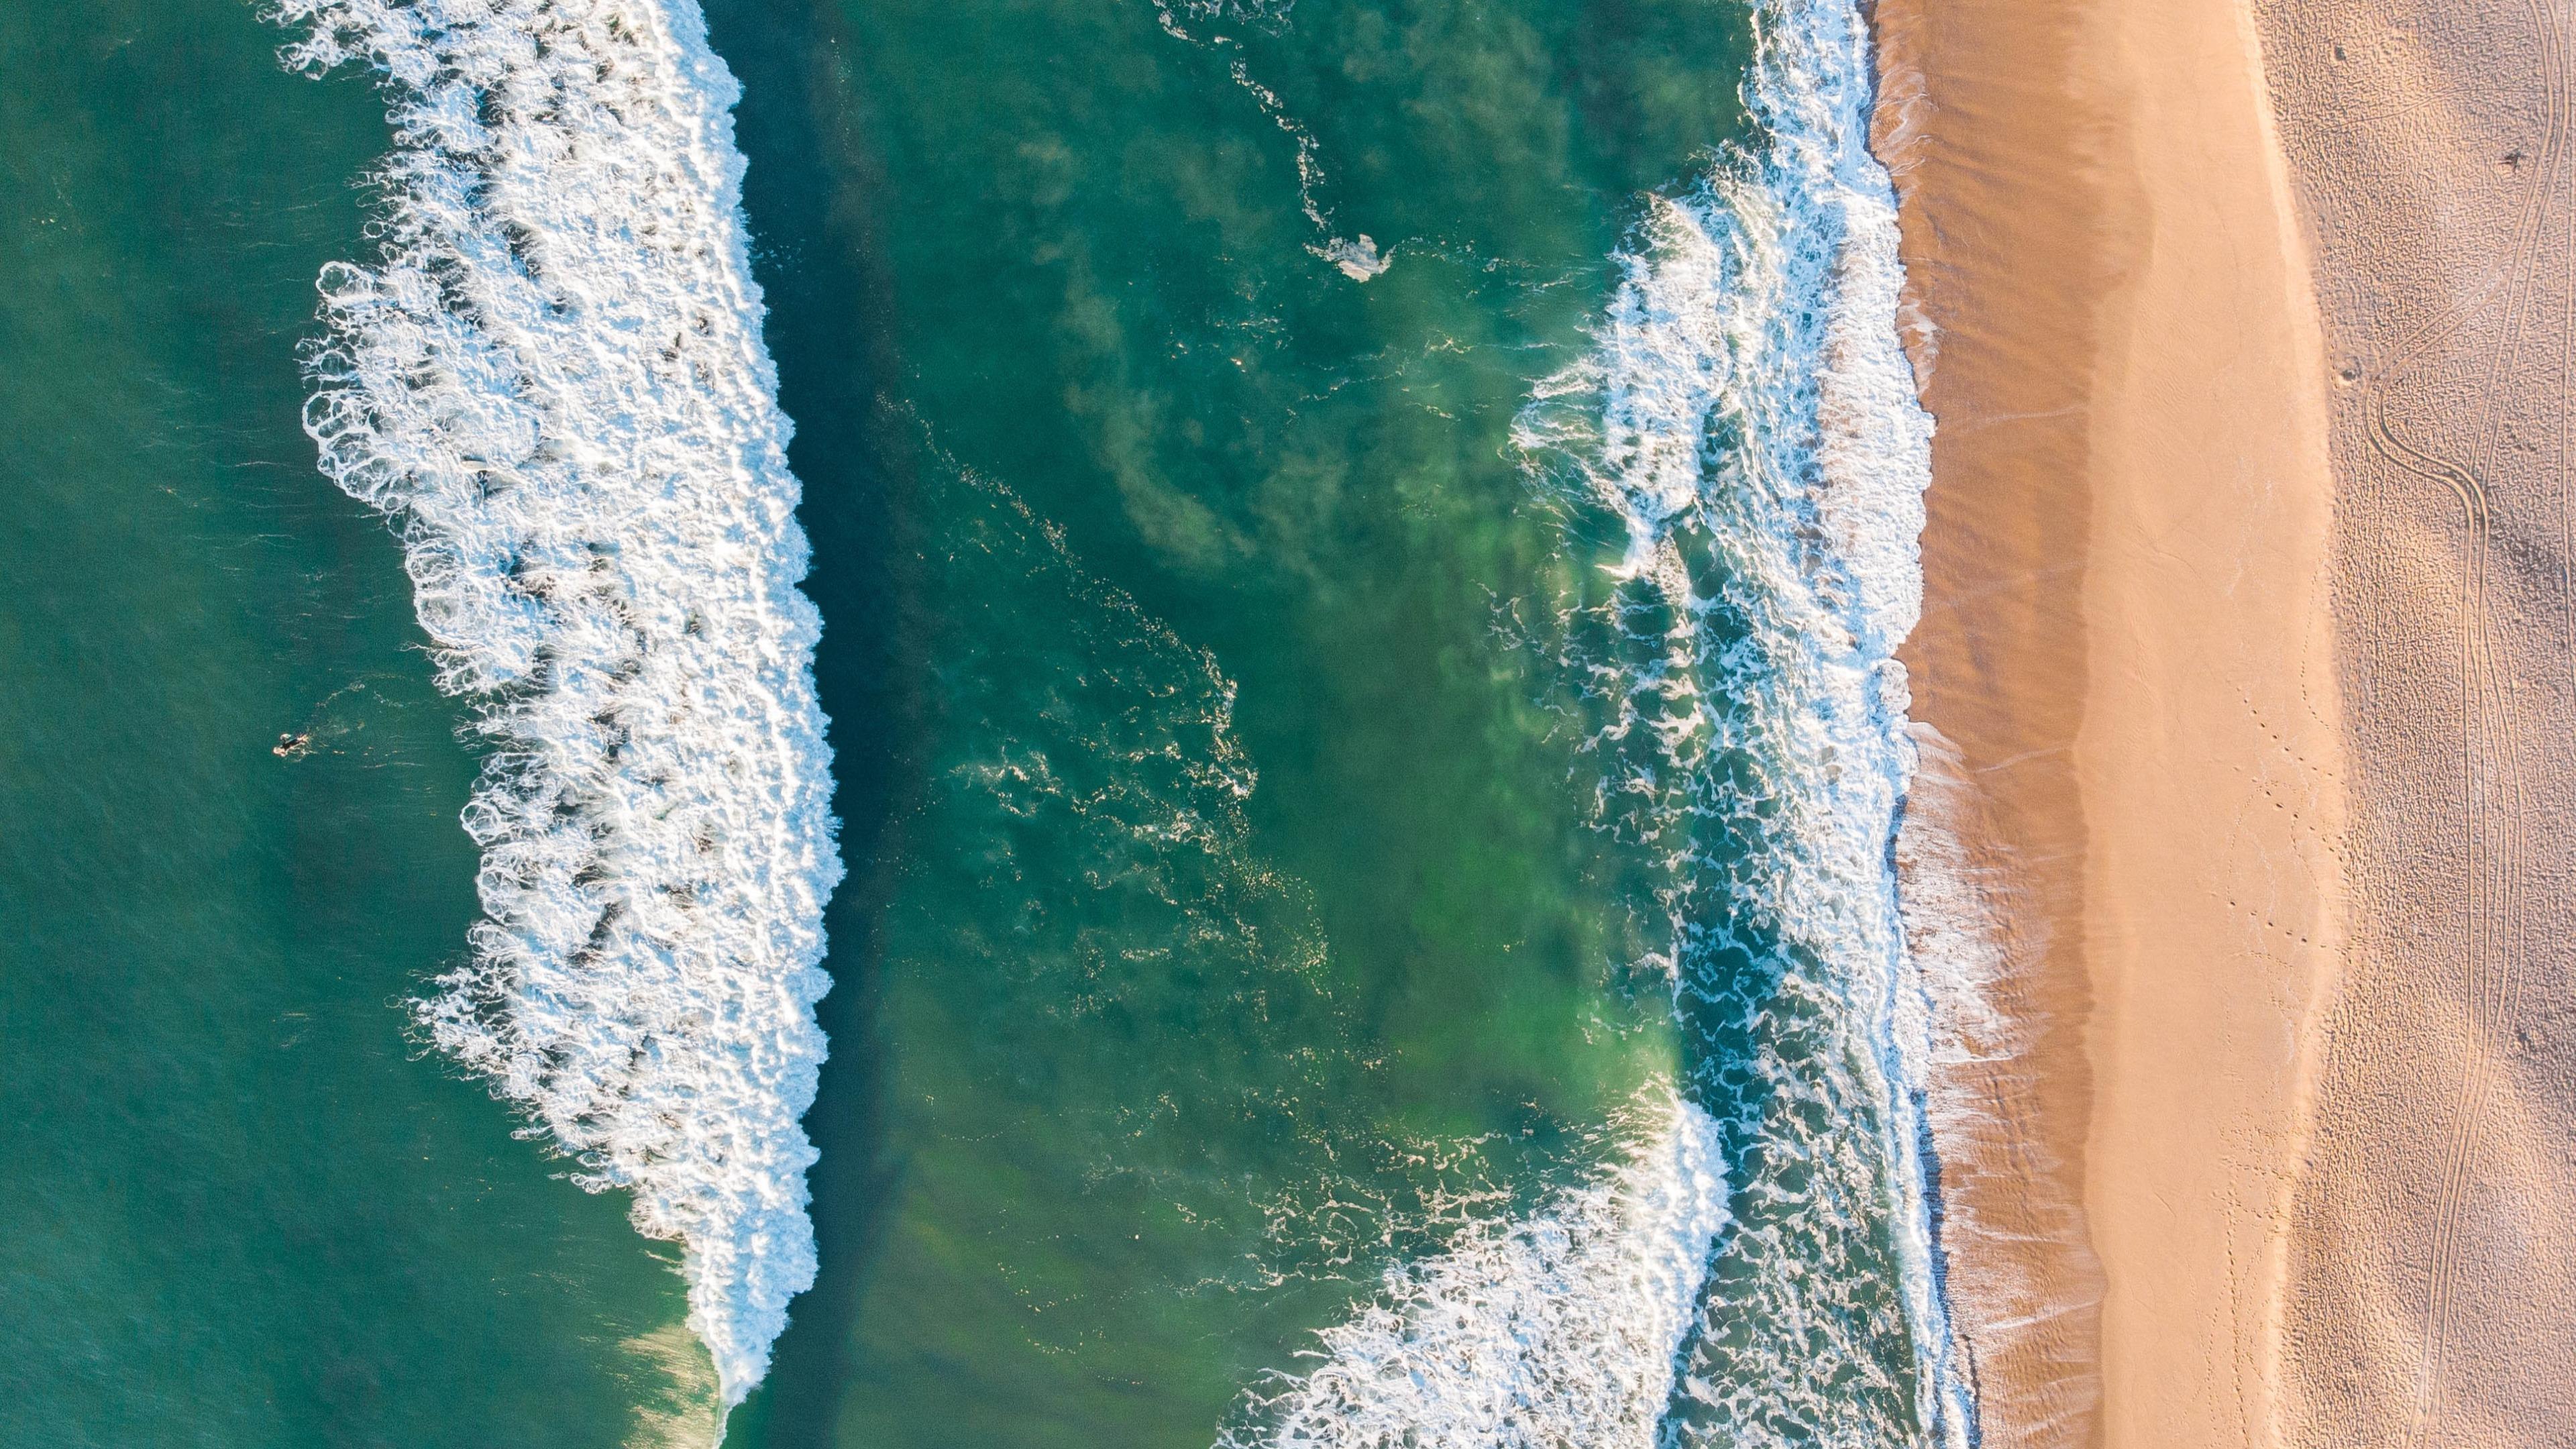 Beach drone view wallpaper